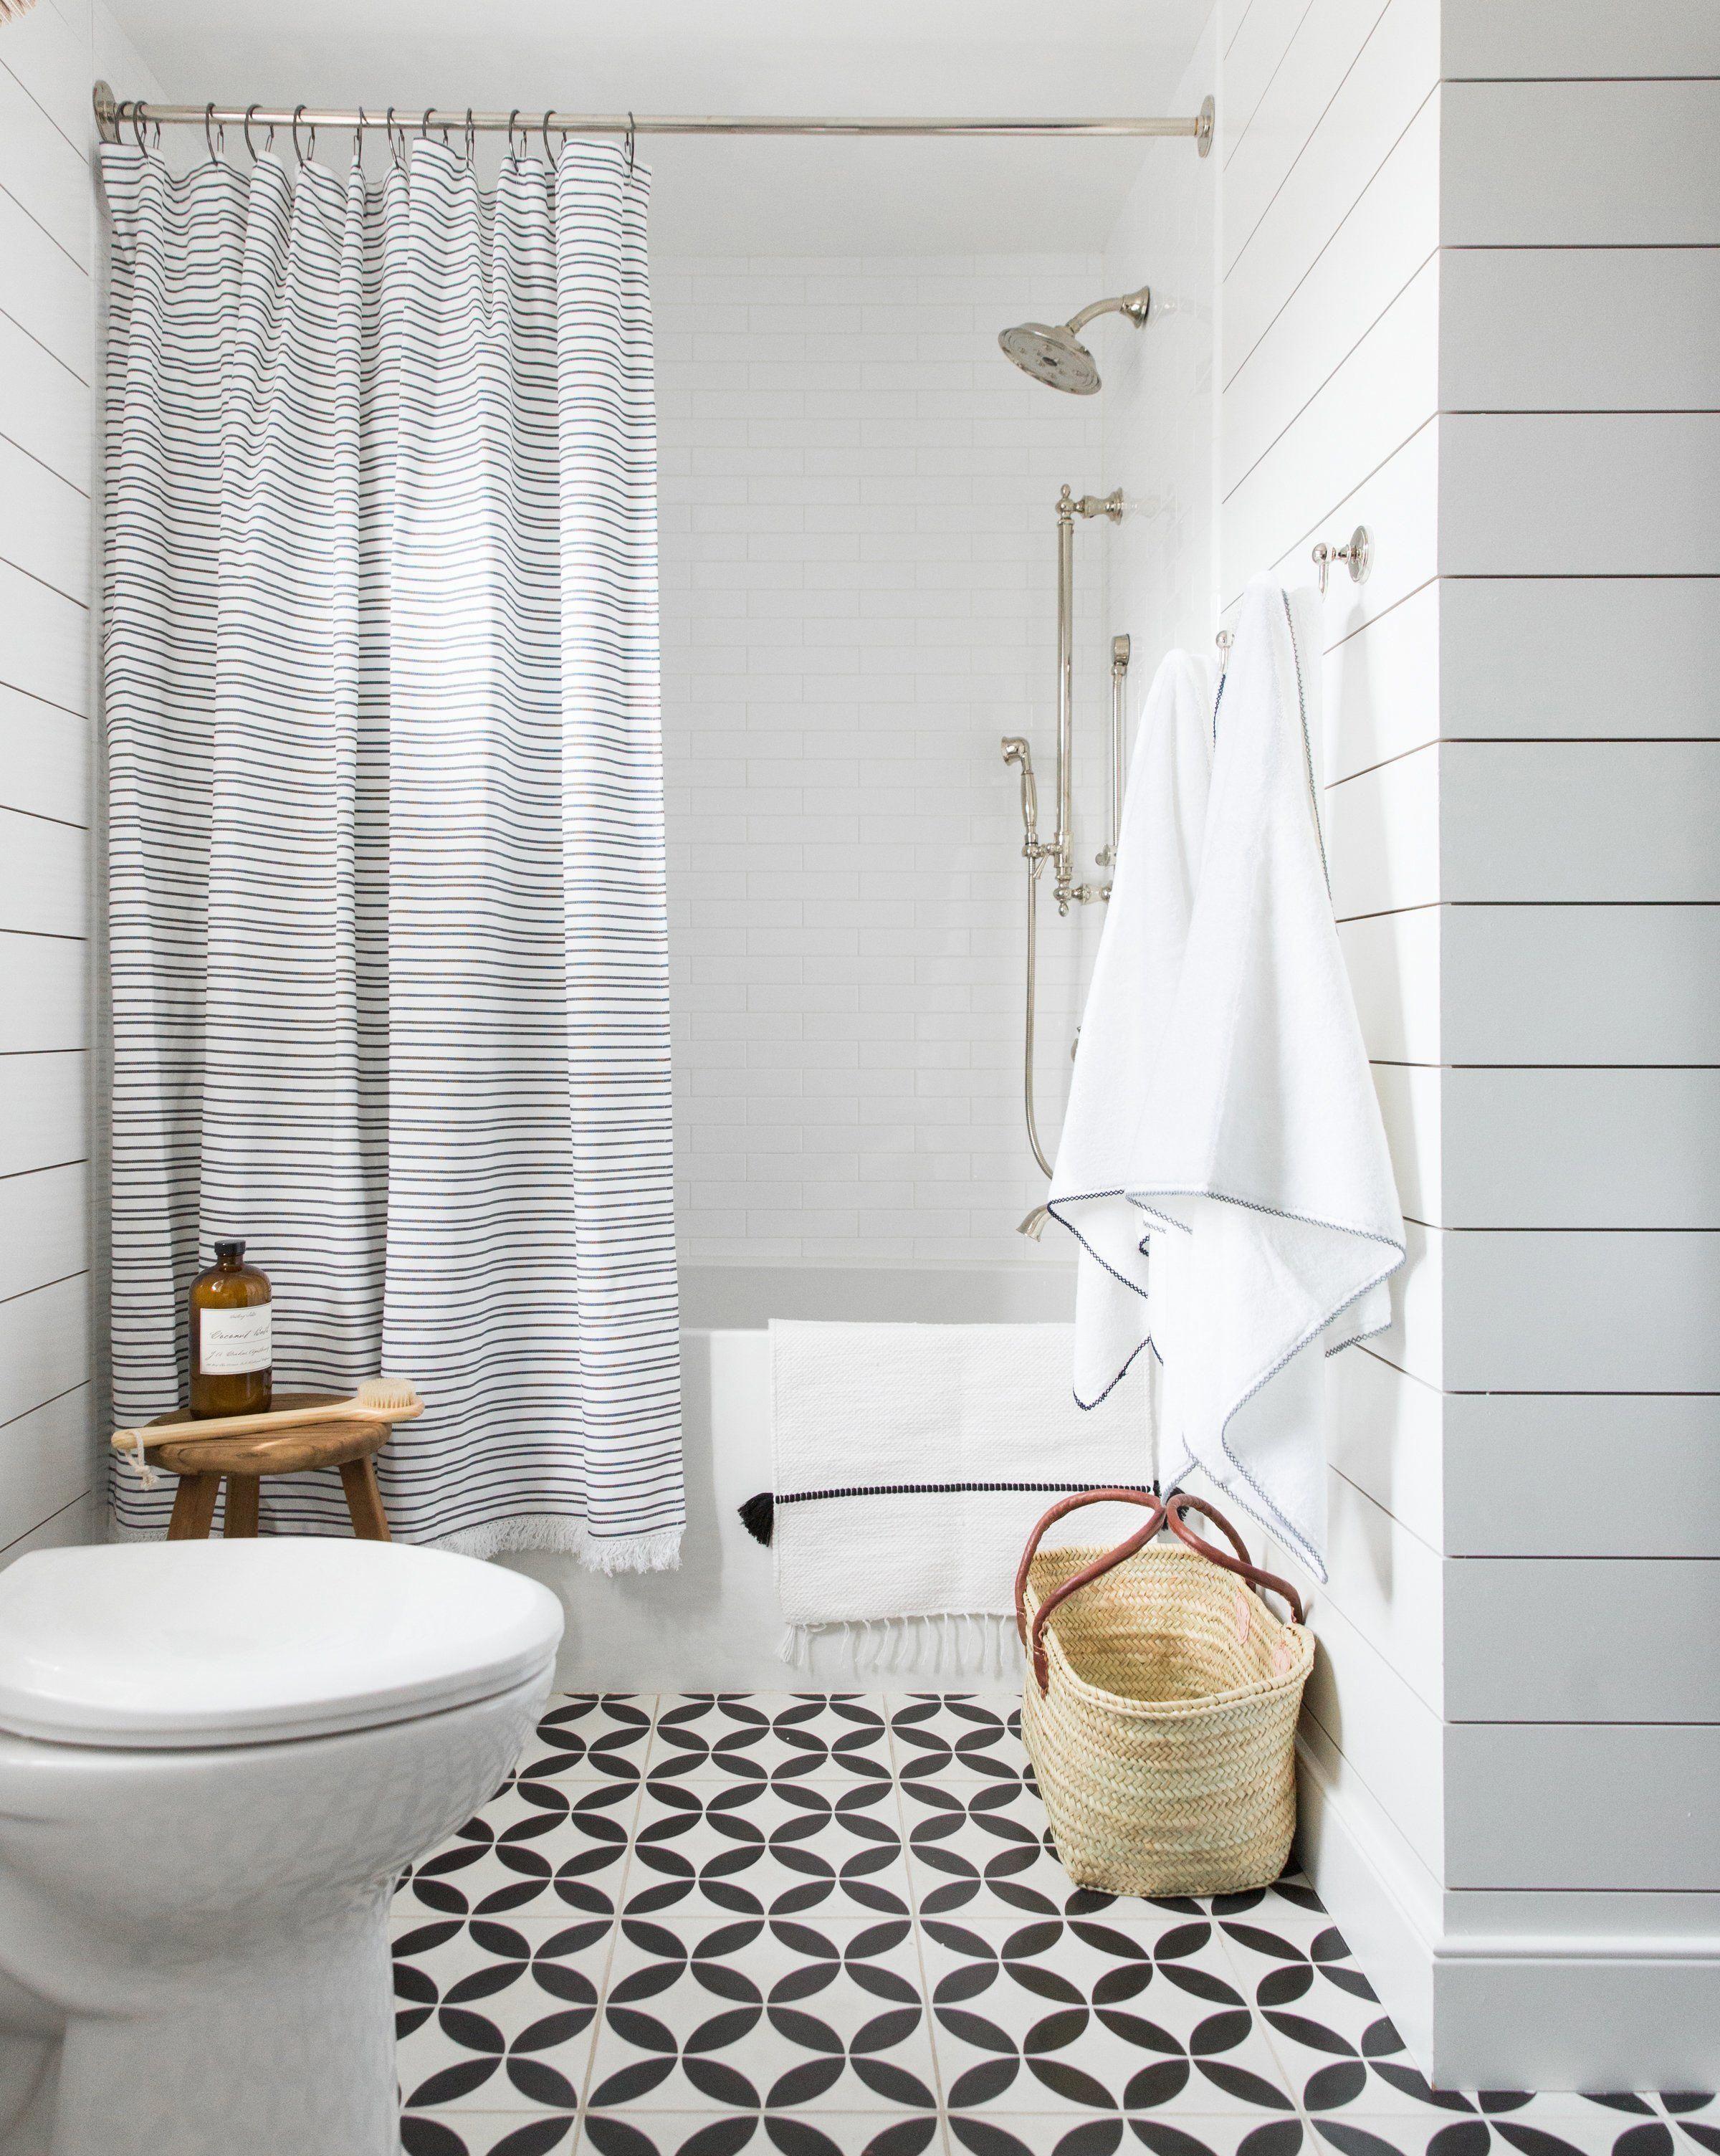 Market Baskets Mcgee Co Rusticremodelingideas Bathroom Shower Curtains Unique Shower Curtain Bathroom Tile Designs